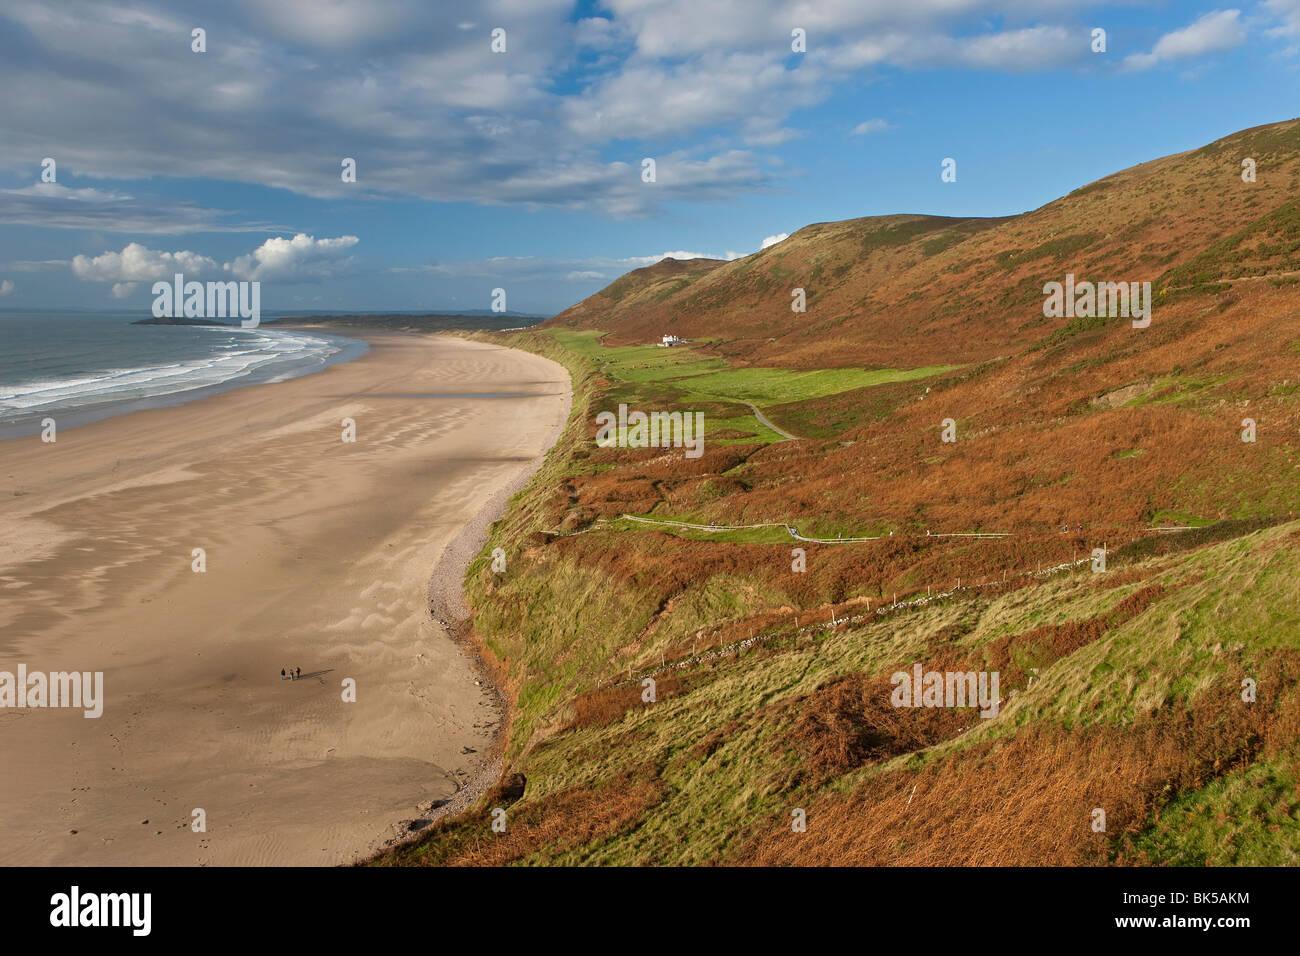 Rhossilli Bay, Gower Peninsula, Glamorgan, Wales, United Kingdom, Europe - Stock Image